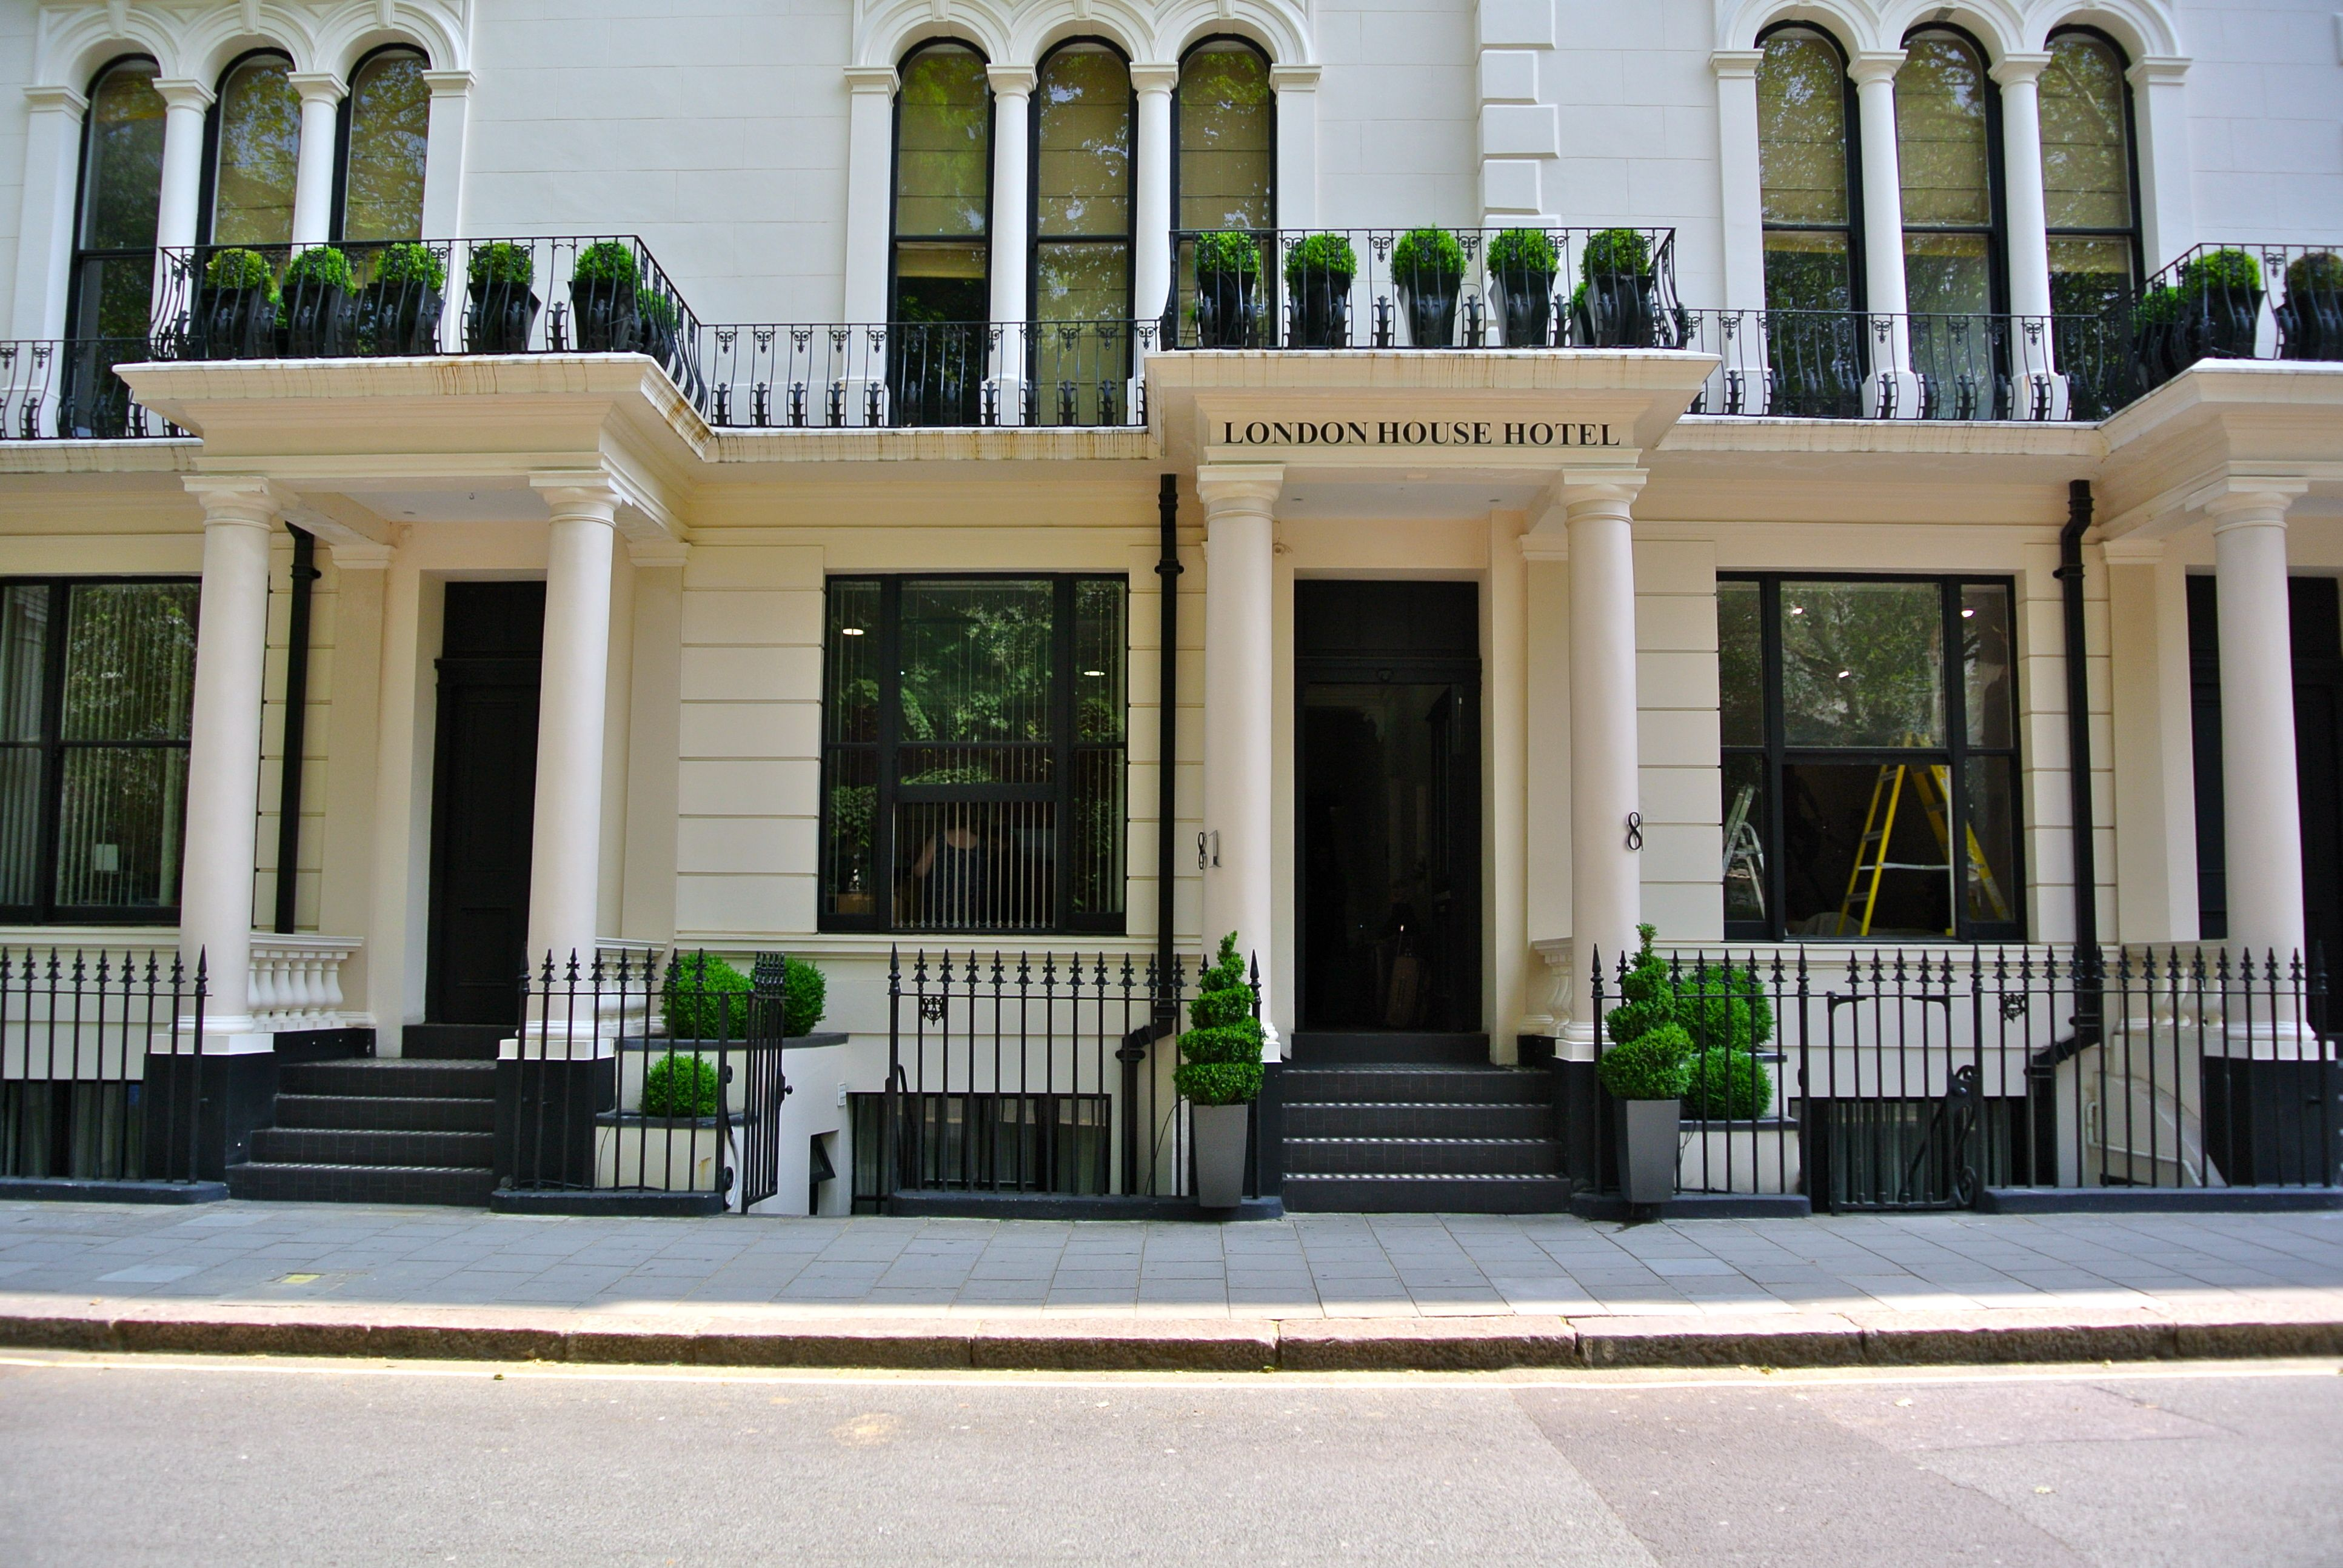 a214ff0927559efd50fb78af9f07bdbc - London House Hotel Kensington 81 Kensington Gardens Square